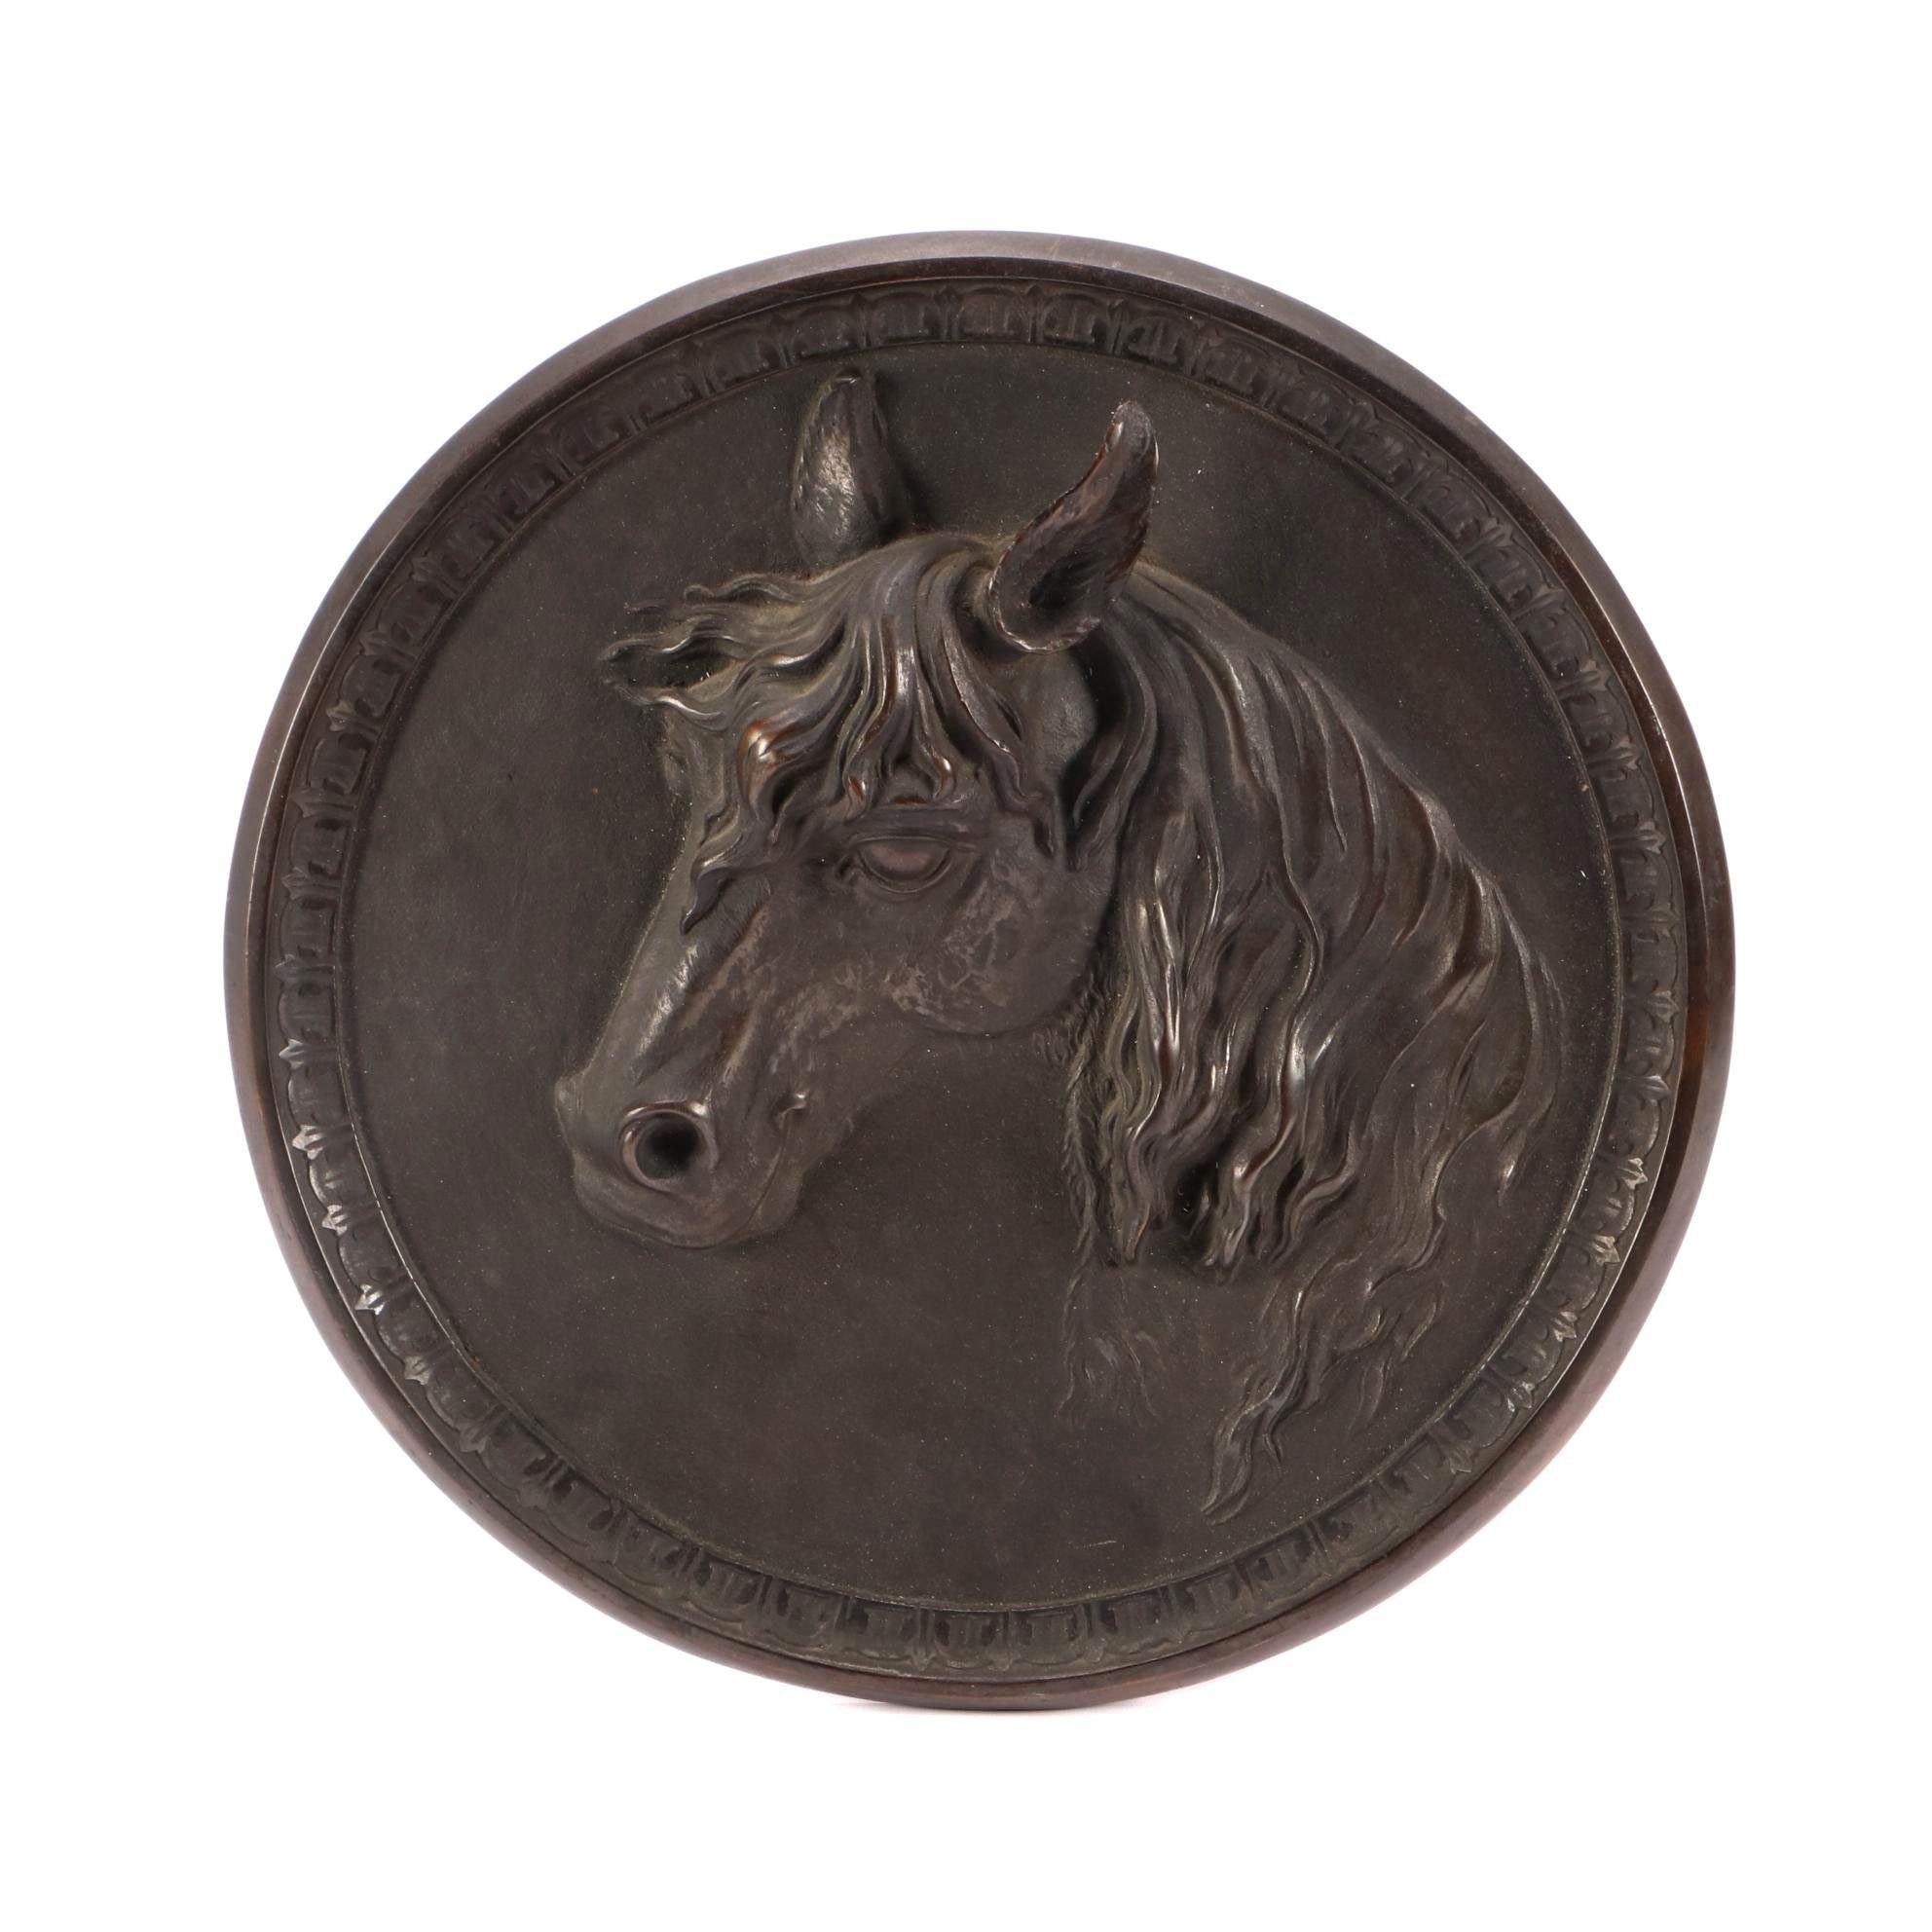 "Cast Iron ""Boucherie Chevaline"" Style Medallion Plaque"